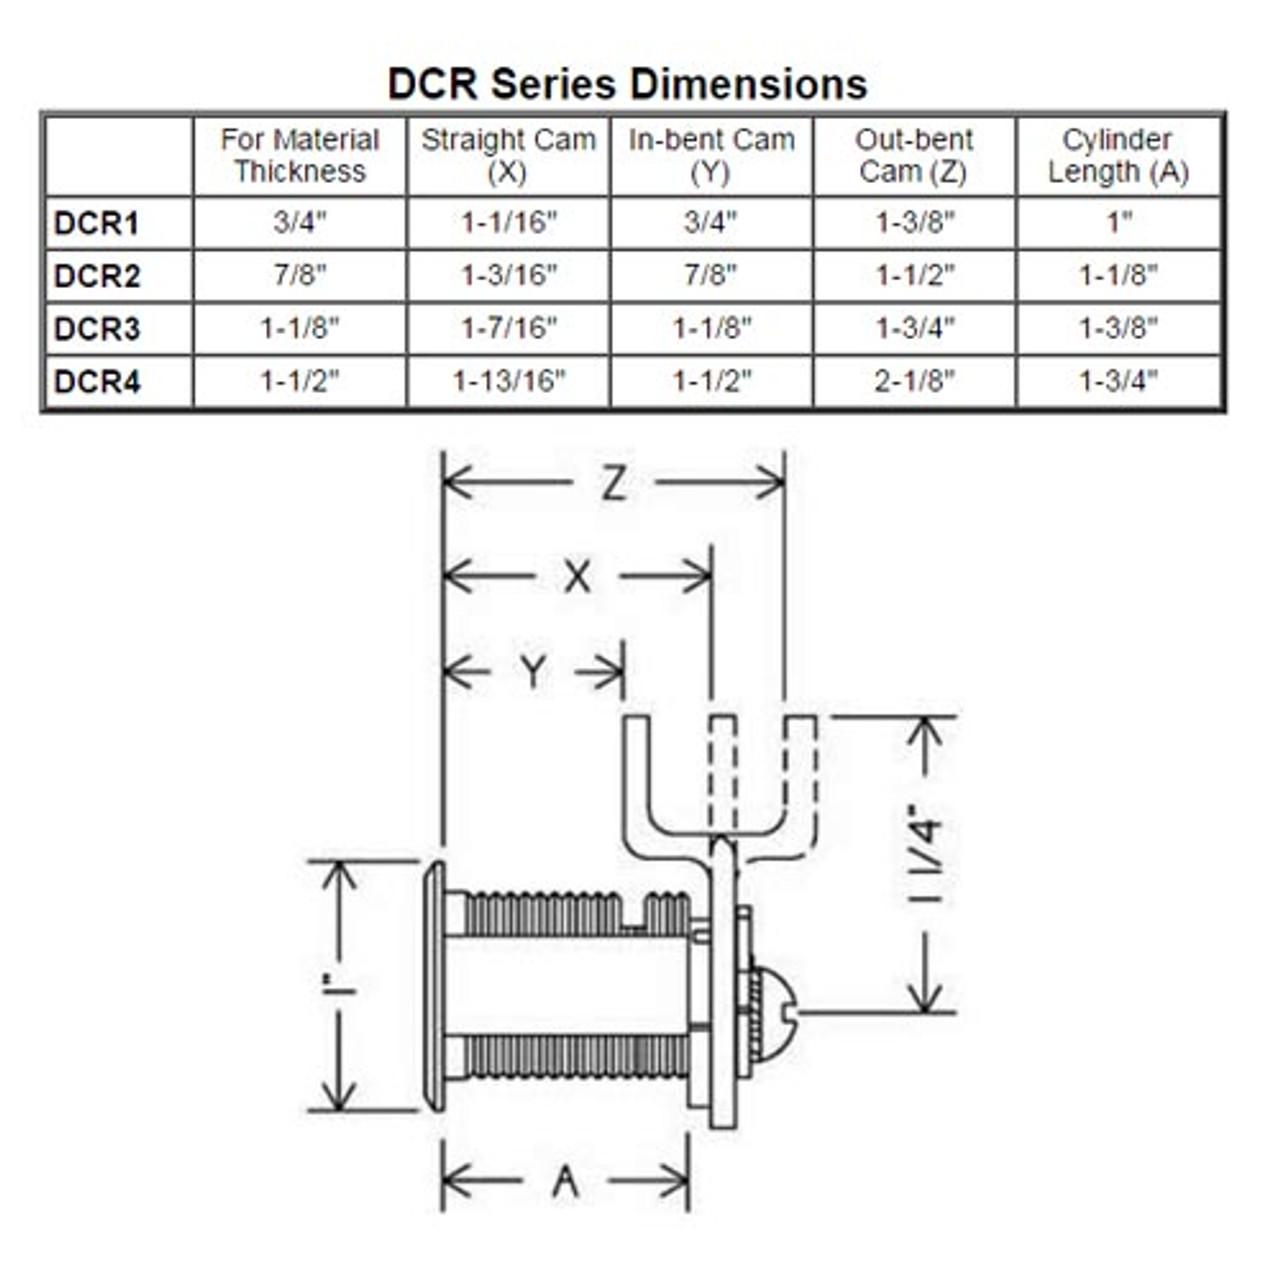 Olympus DCR4-KD-26D R Series Keyed Different Reversible Cam Lock in Satin Chrome